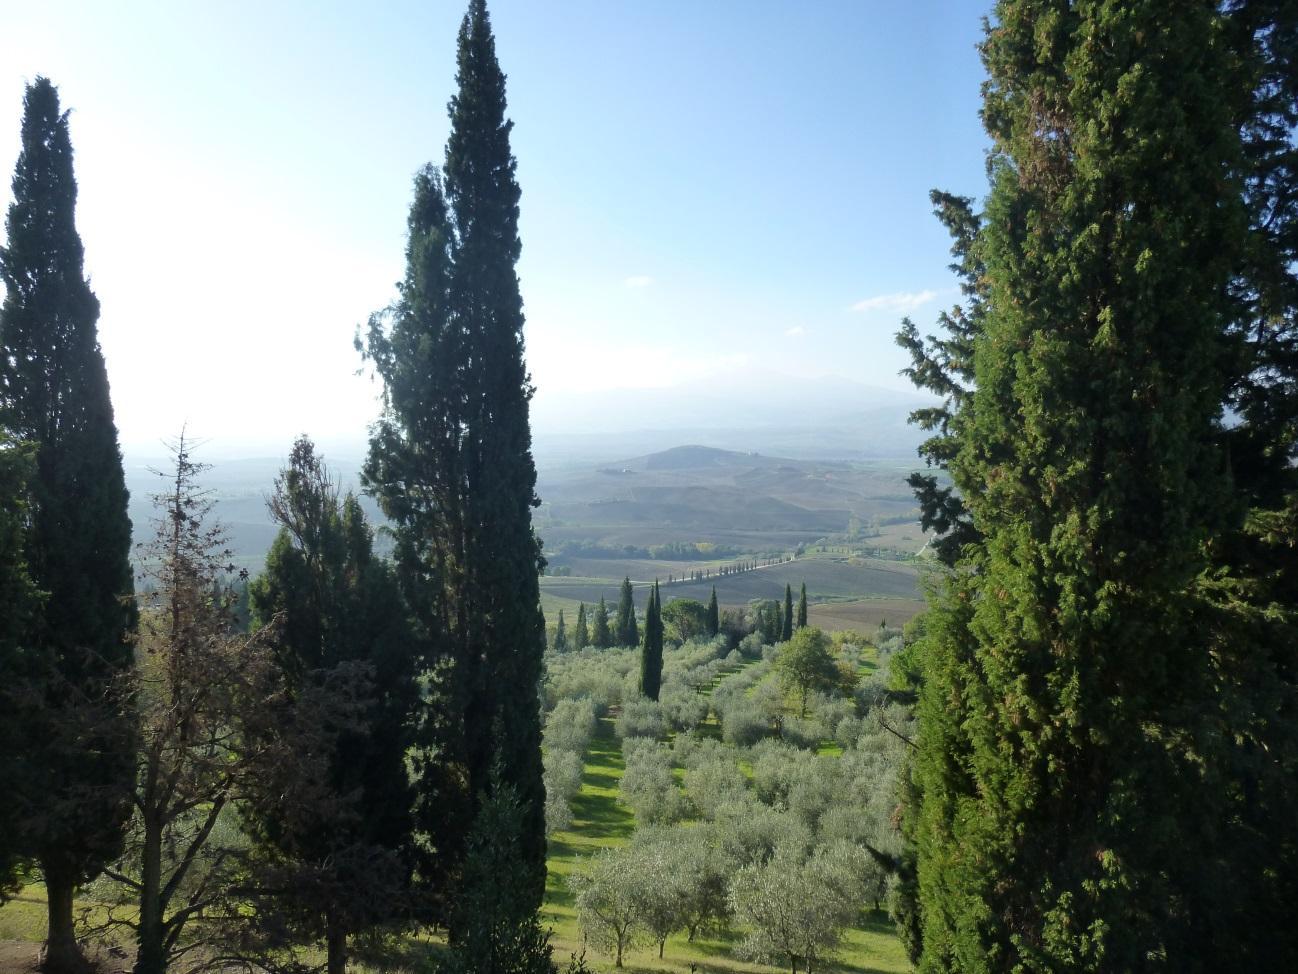 C:\Users\Gonzalo\Desktop\Documentos\Fotografías\La Toscana\103_PANA\103_PANA\P1030470.JPG